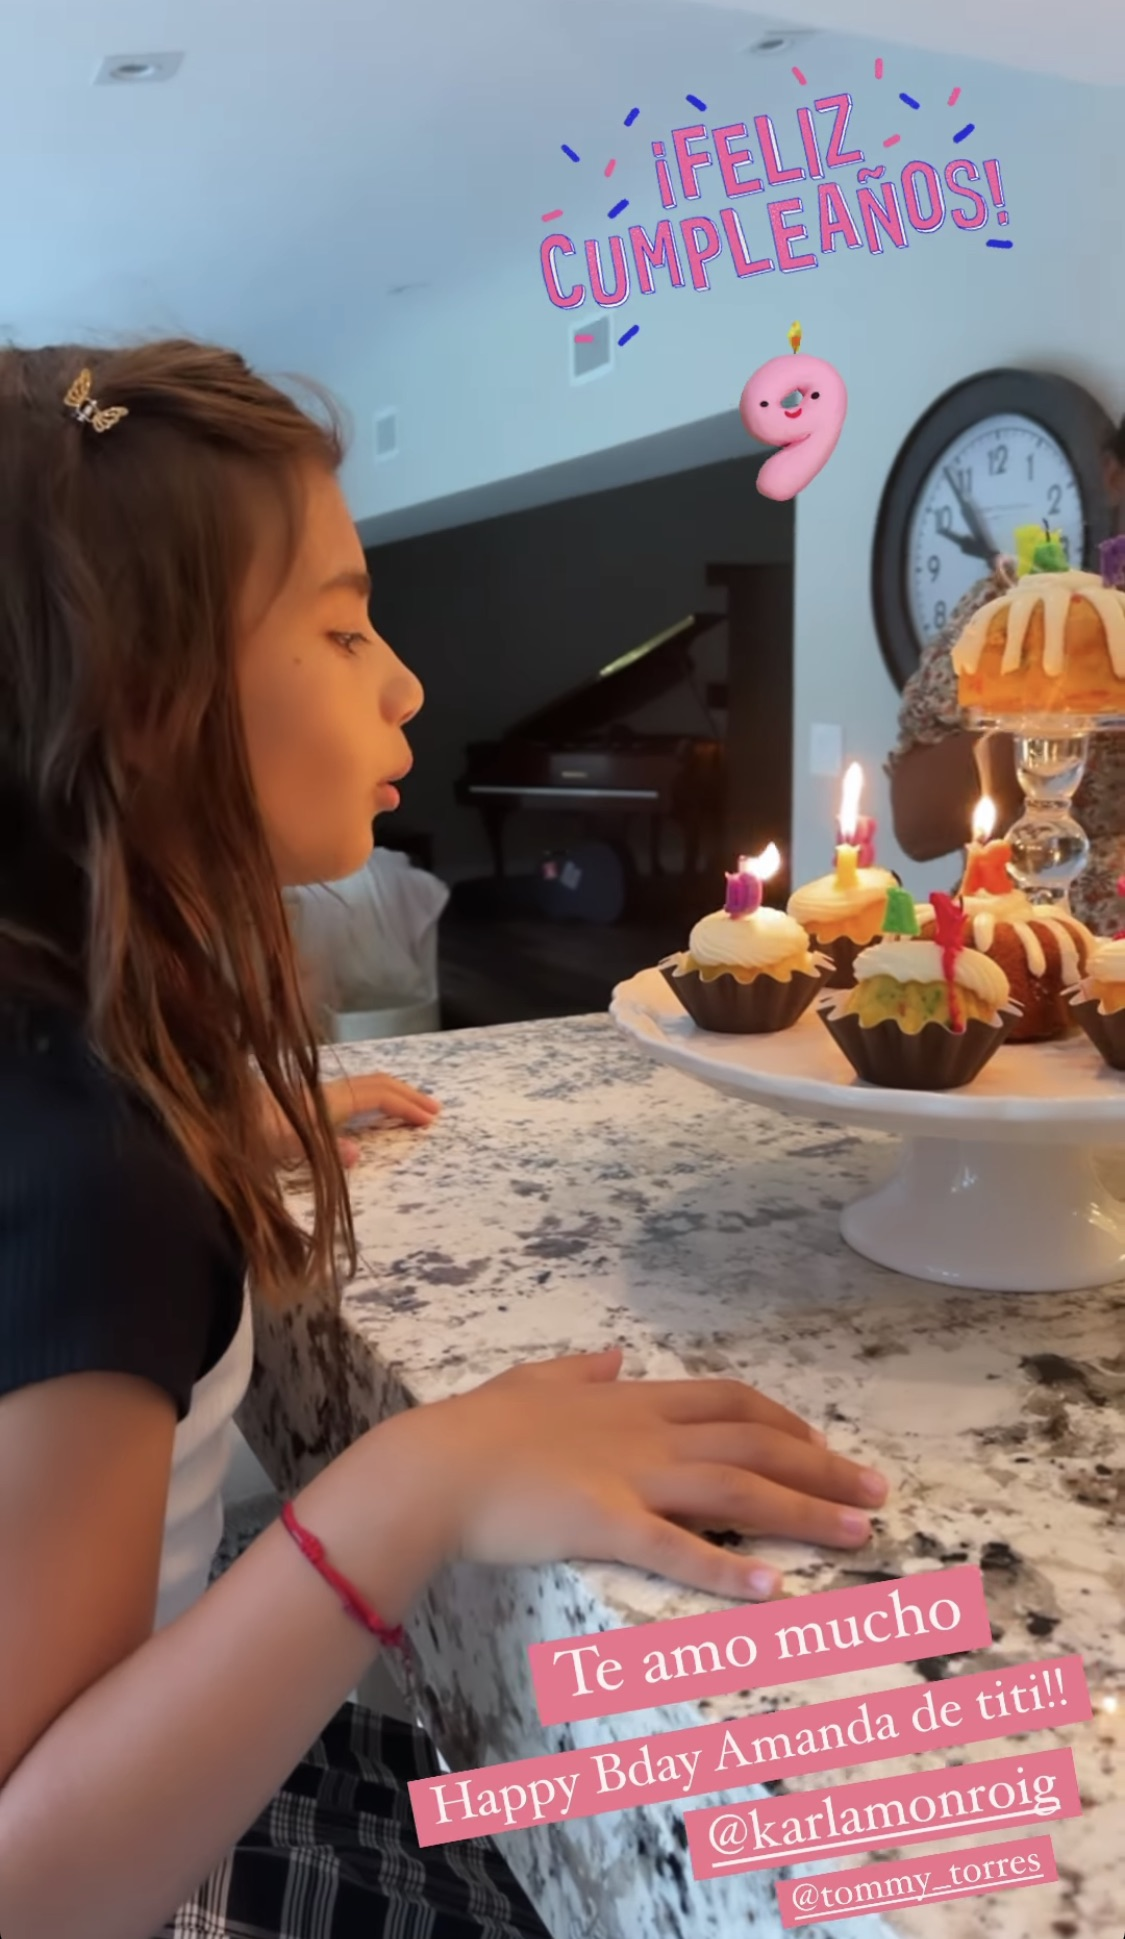 Adamari Lopez post hija Karla Monroig